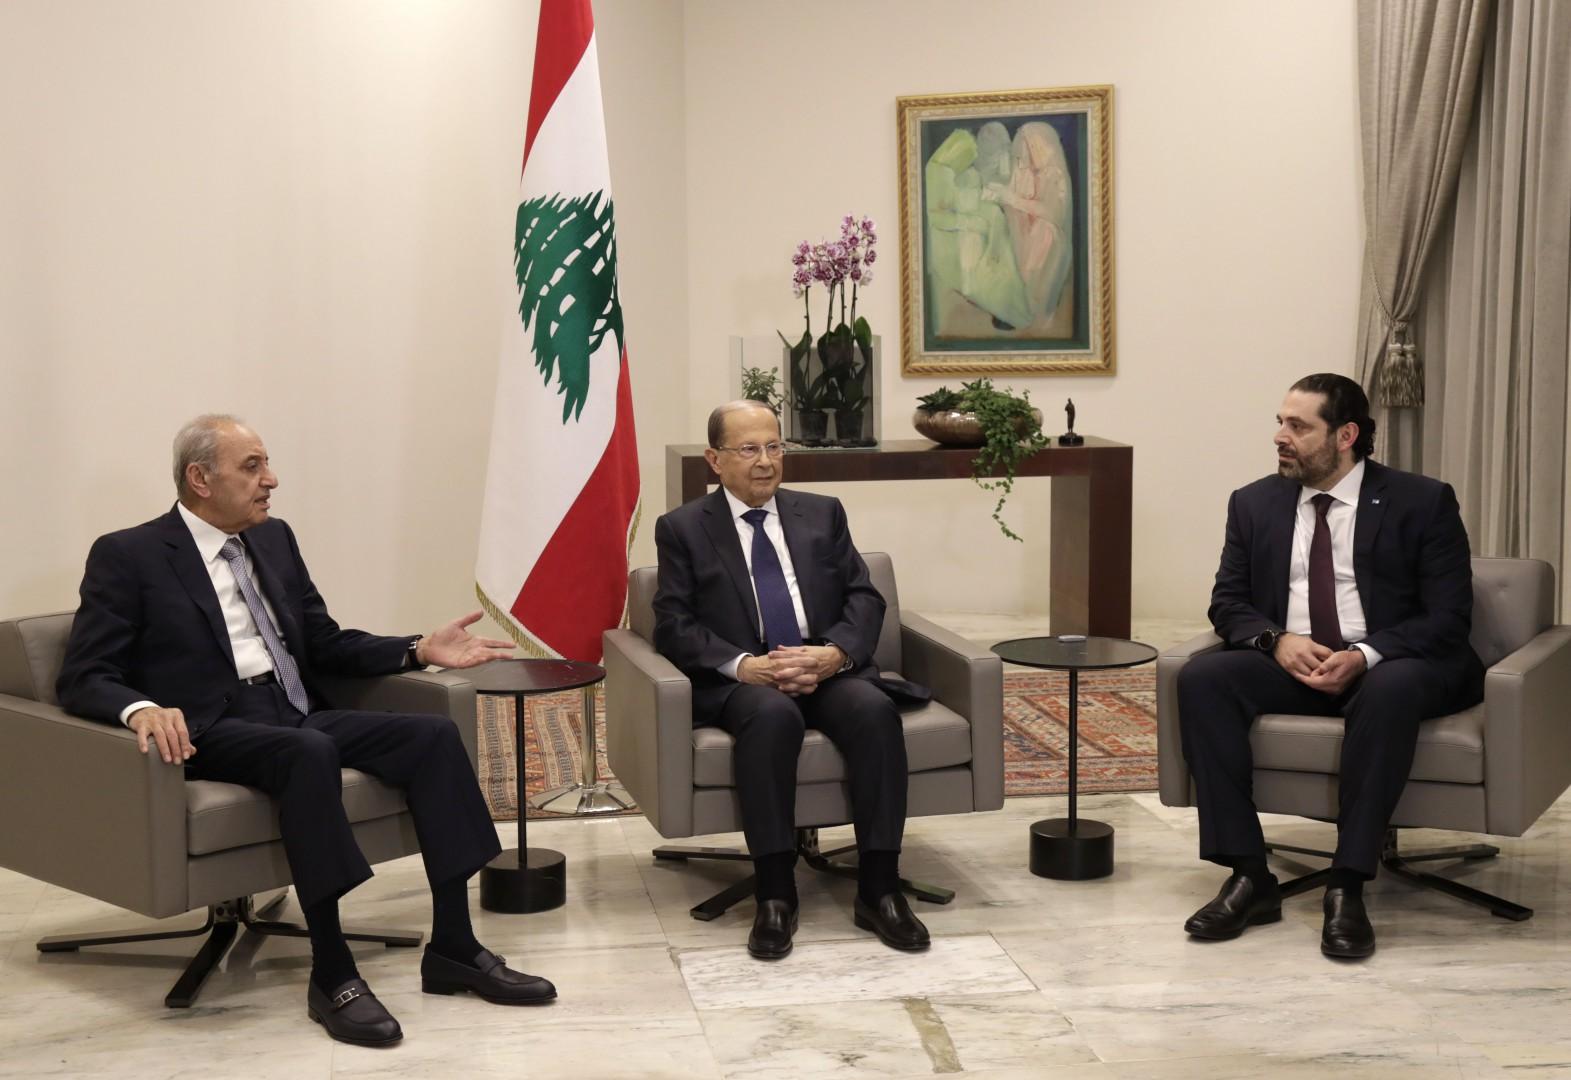 Lebanese President Michel Aoun (C), Prime Minister Saad Hariri (R), and House Speaker Nabih Berri meet at the presidential palace in Baabda, east of the capital Beirut, on January 31, 2019. (Photo by ANWAR AMRO / AFP)